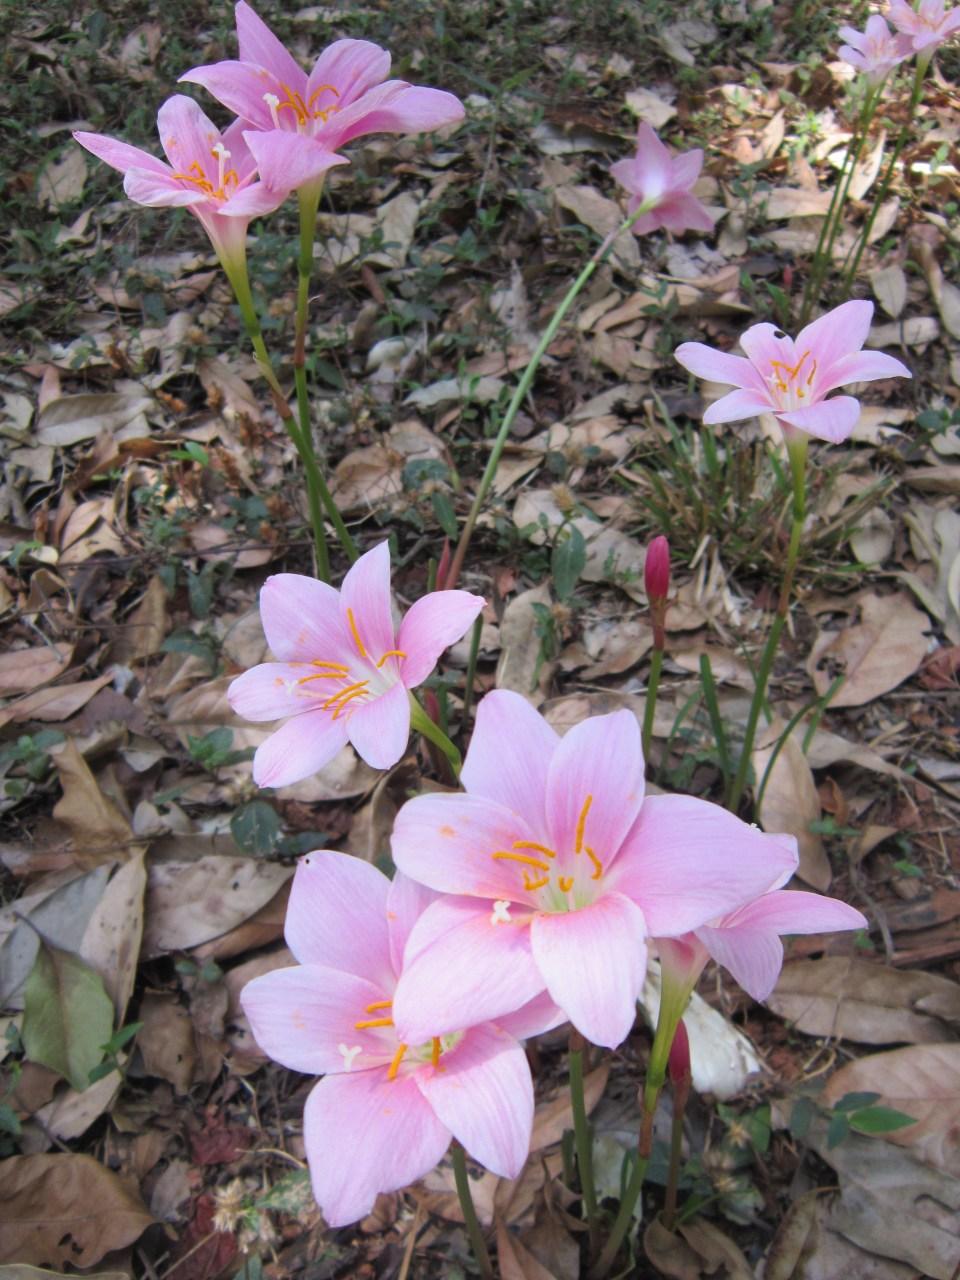 Pyin Oo Lwin - National Kandawgyi Botanical Gardens - pink fowers